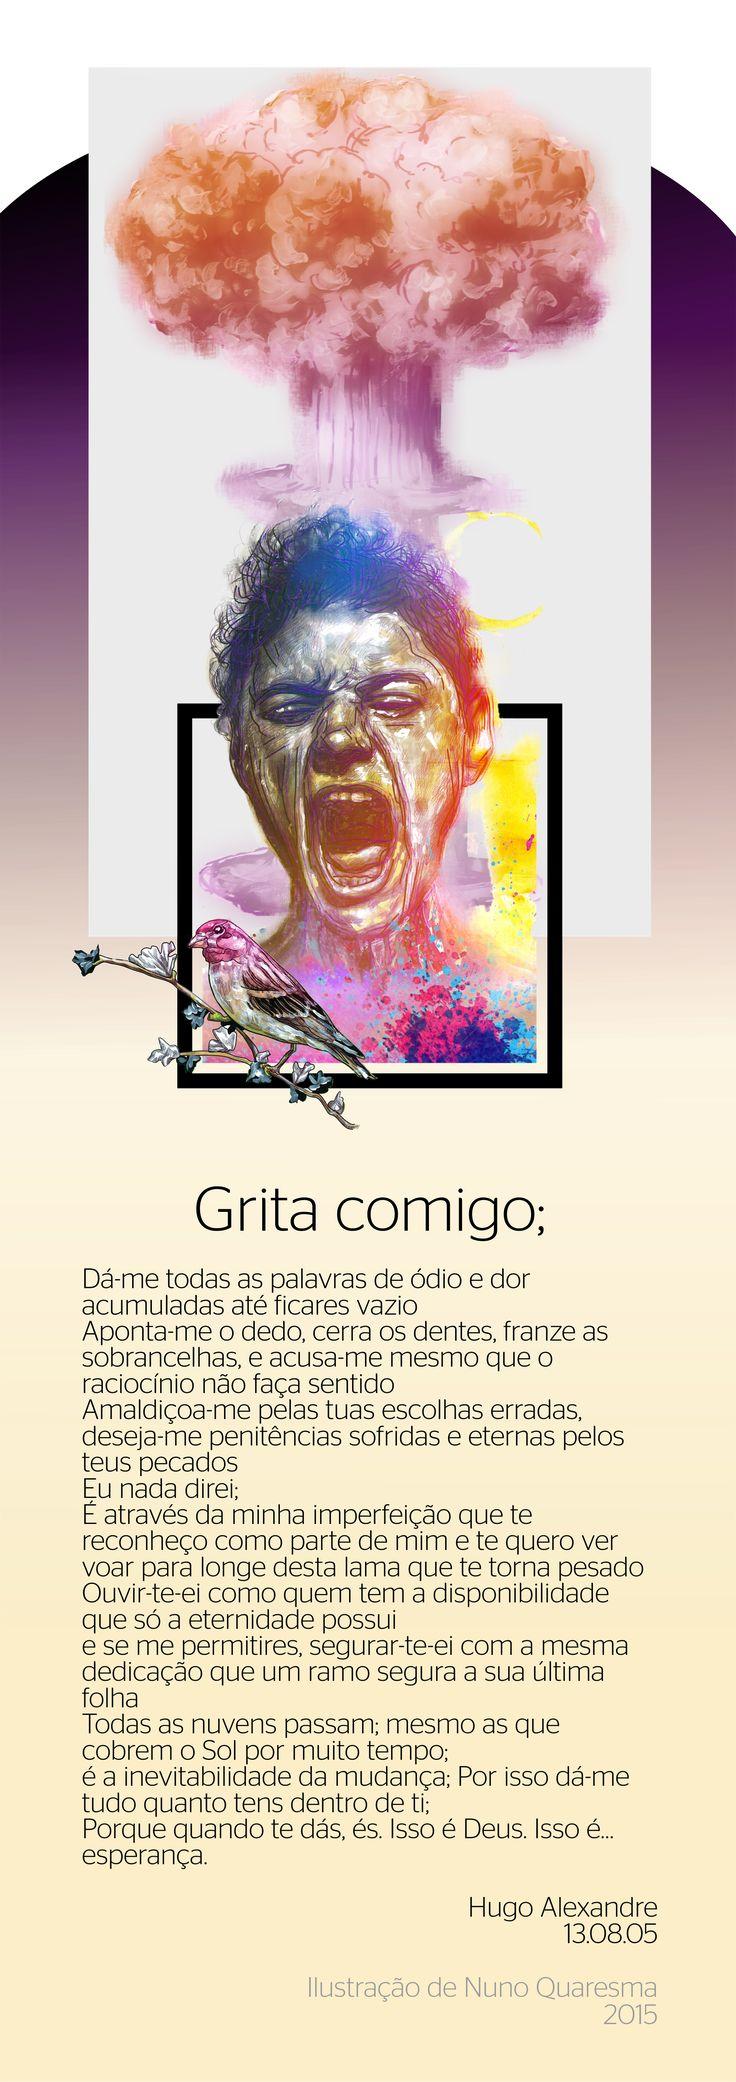 Nuno Quaresma on Behance